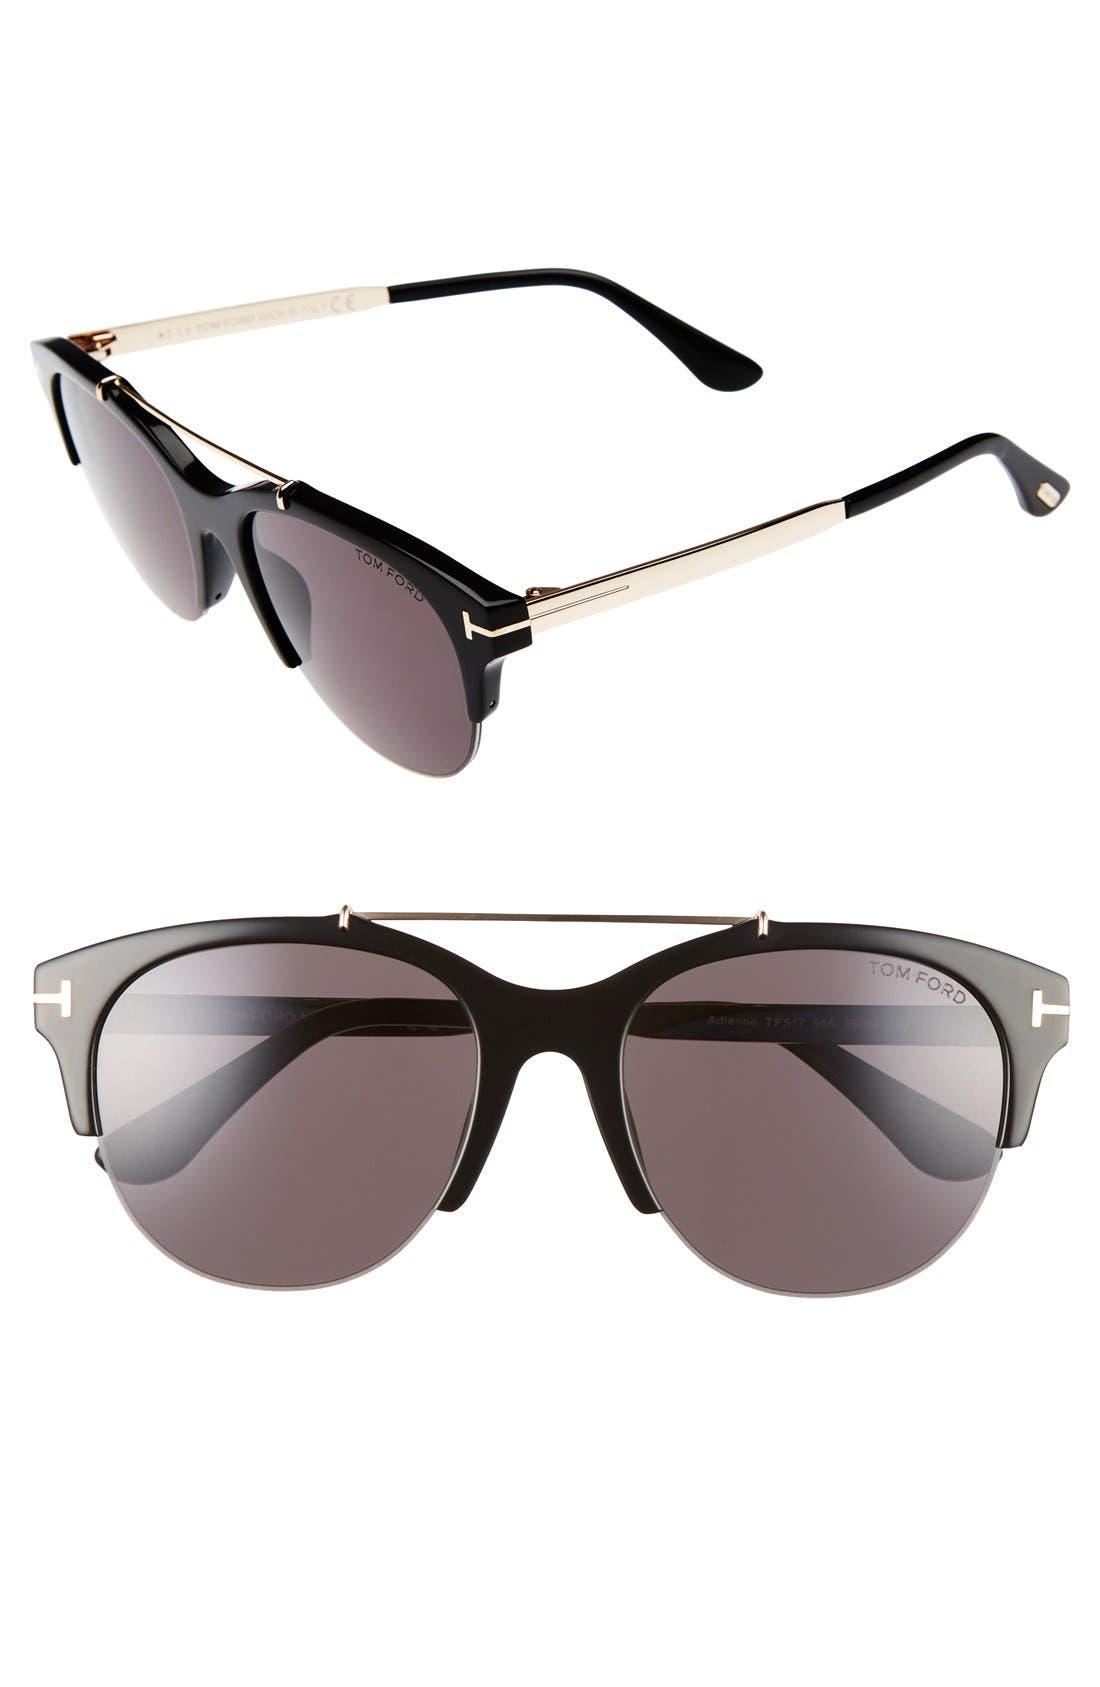 Adrenne 55mm Sunglasses,                         Main,                         color, Black/ Rose Gold/ Smoke